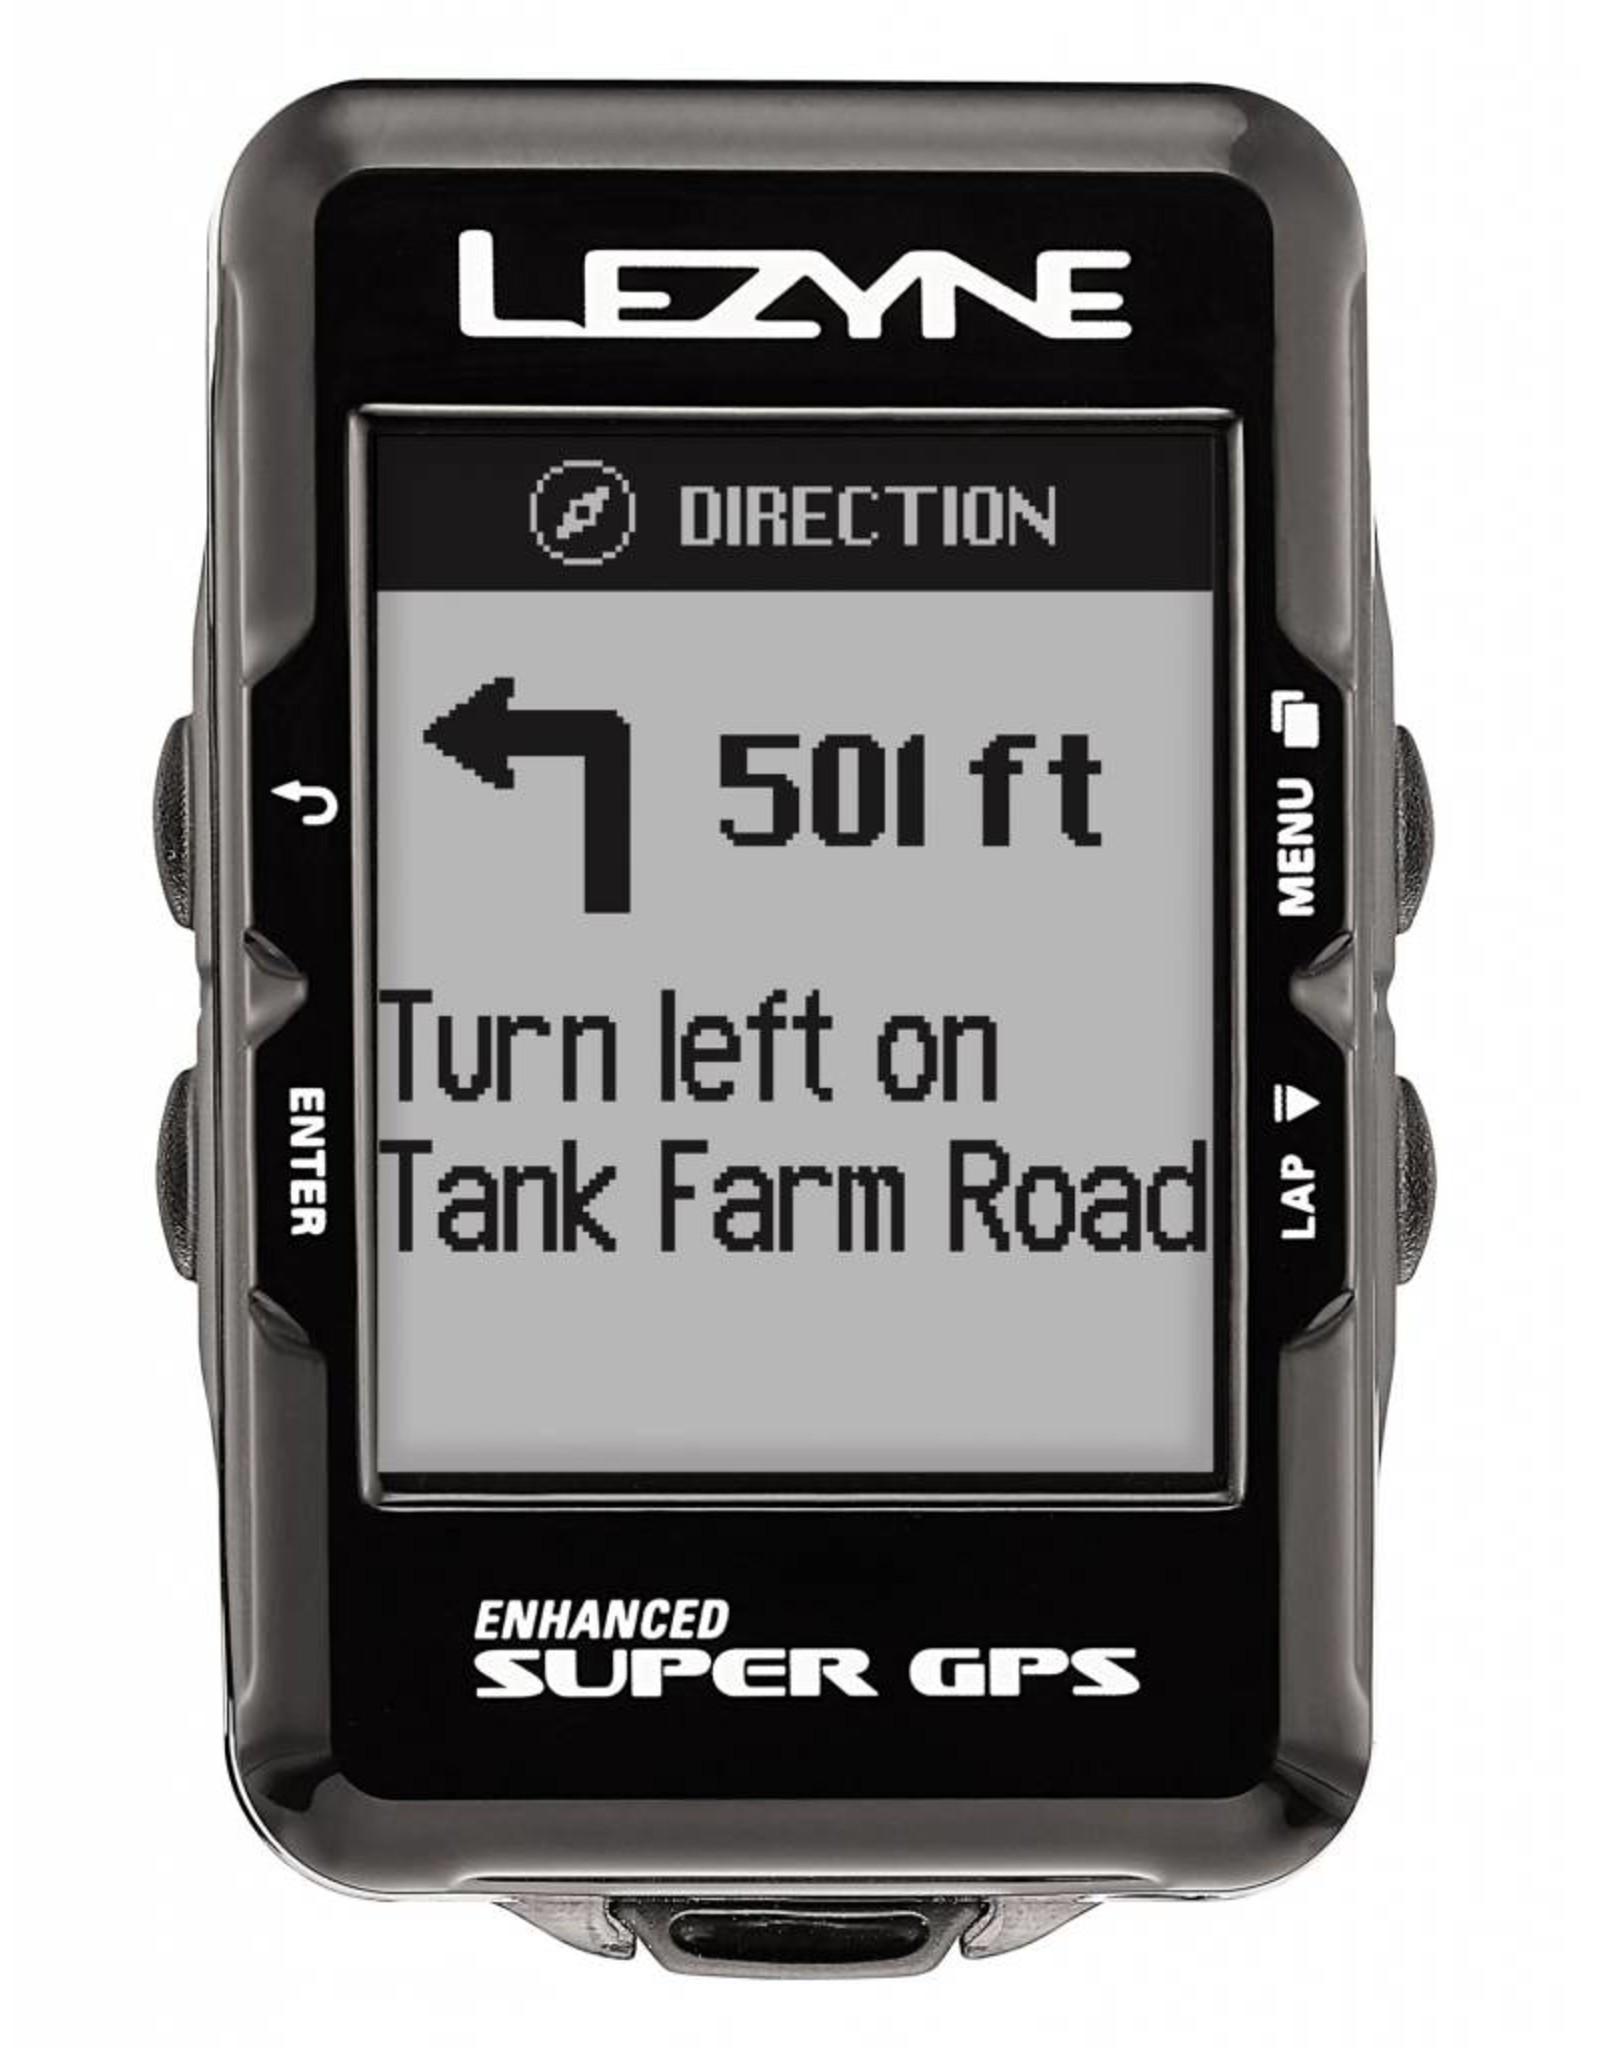 Lezyne Lezyne Super GPS Cyclocomputer Unit